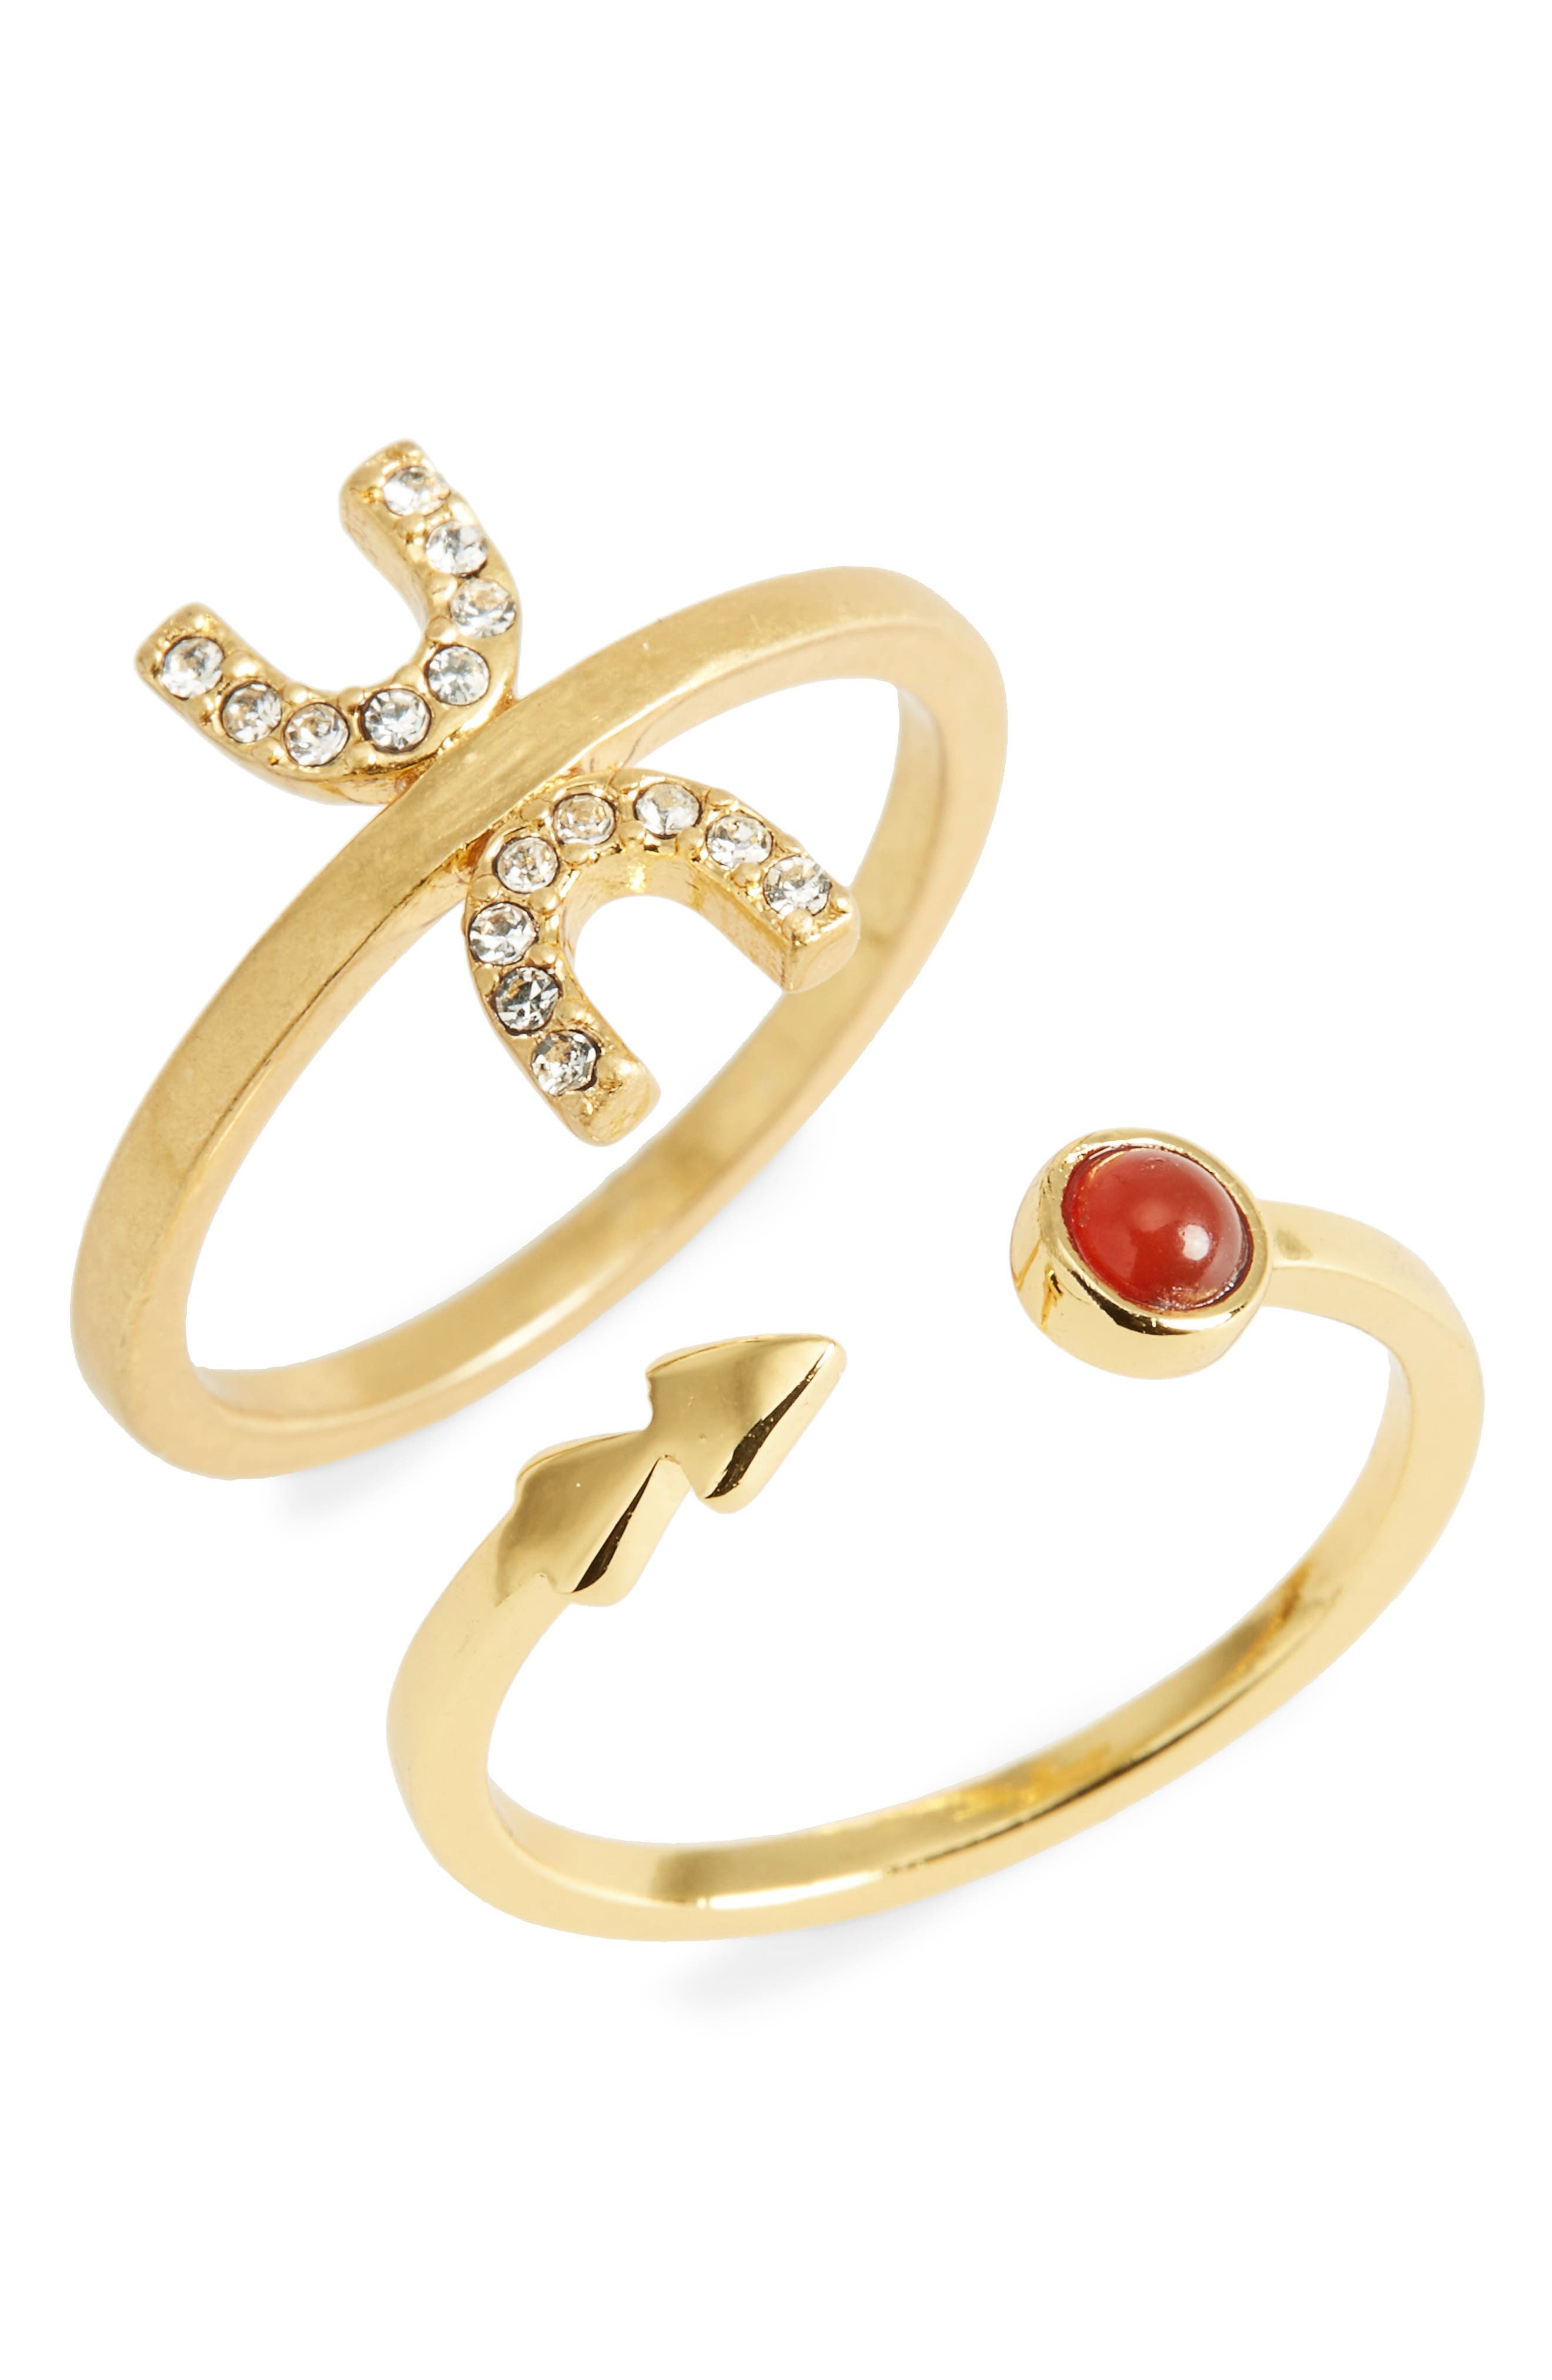 Tiny Jewels Set of 2 Stacking Rings,                             Main thumbnail 1, color,                             710